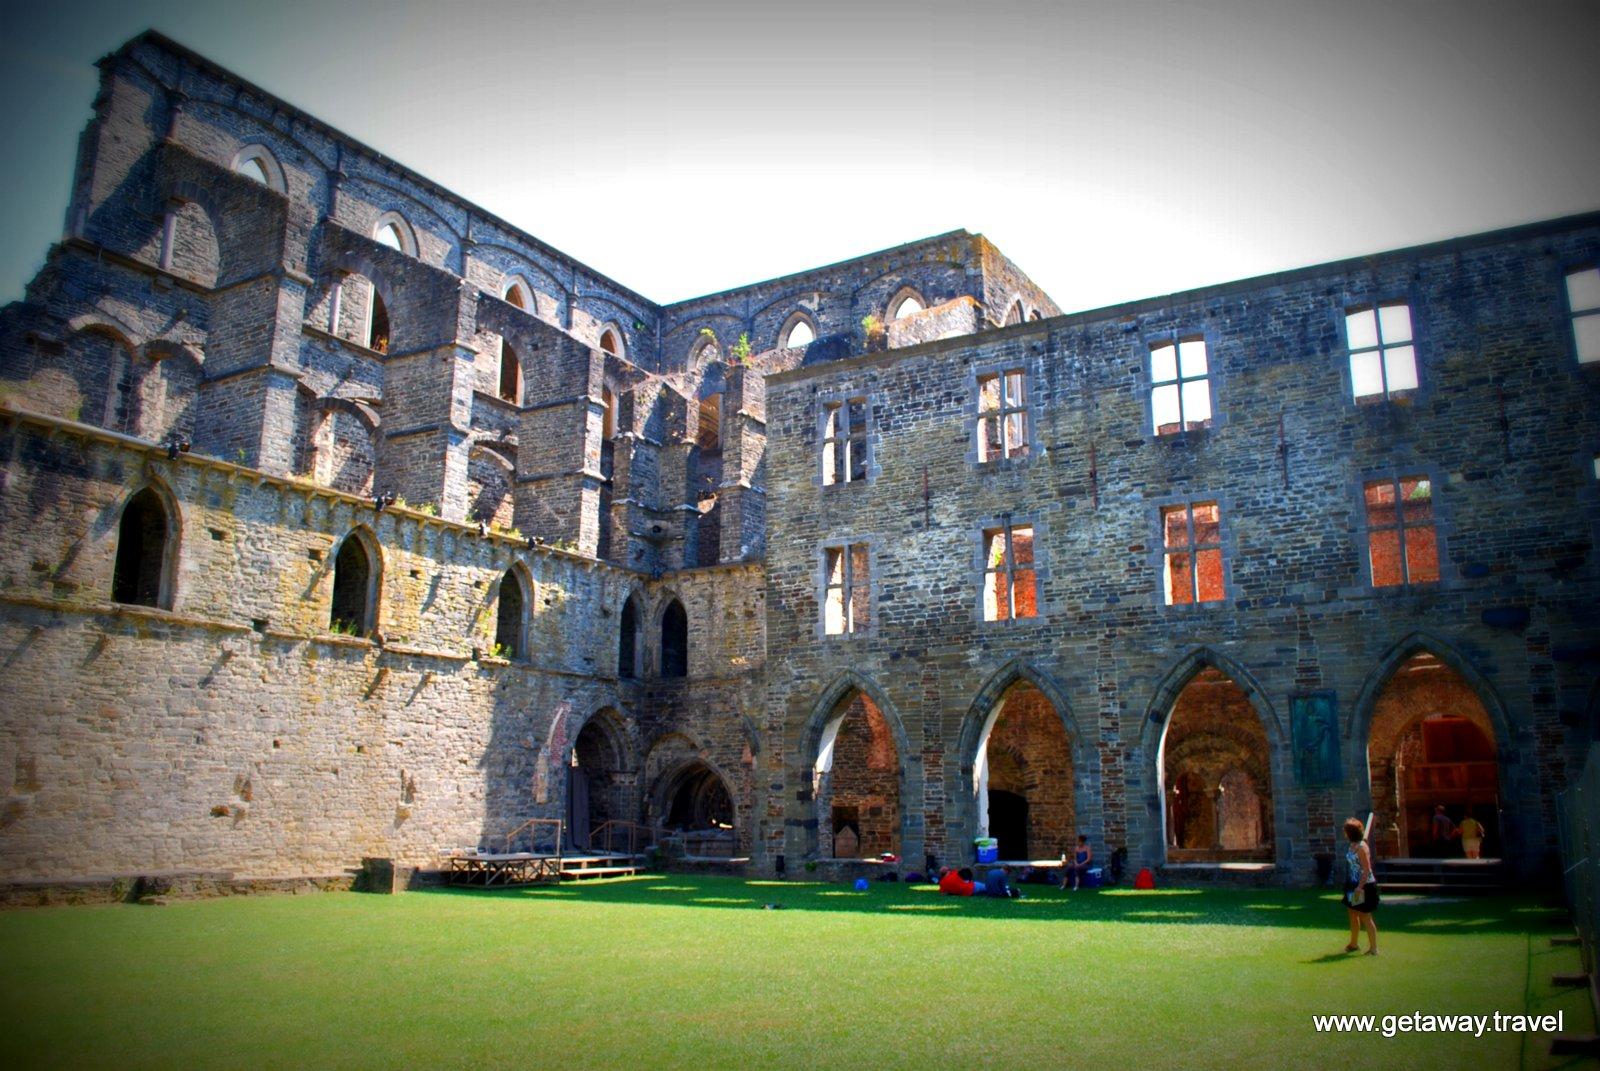 Villers Abbey Province Of Wallonia Belgium Getaway